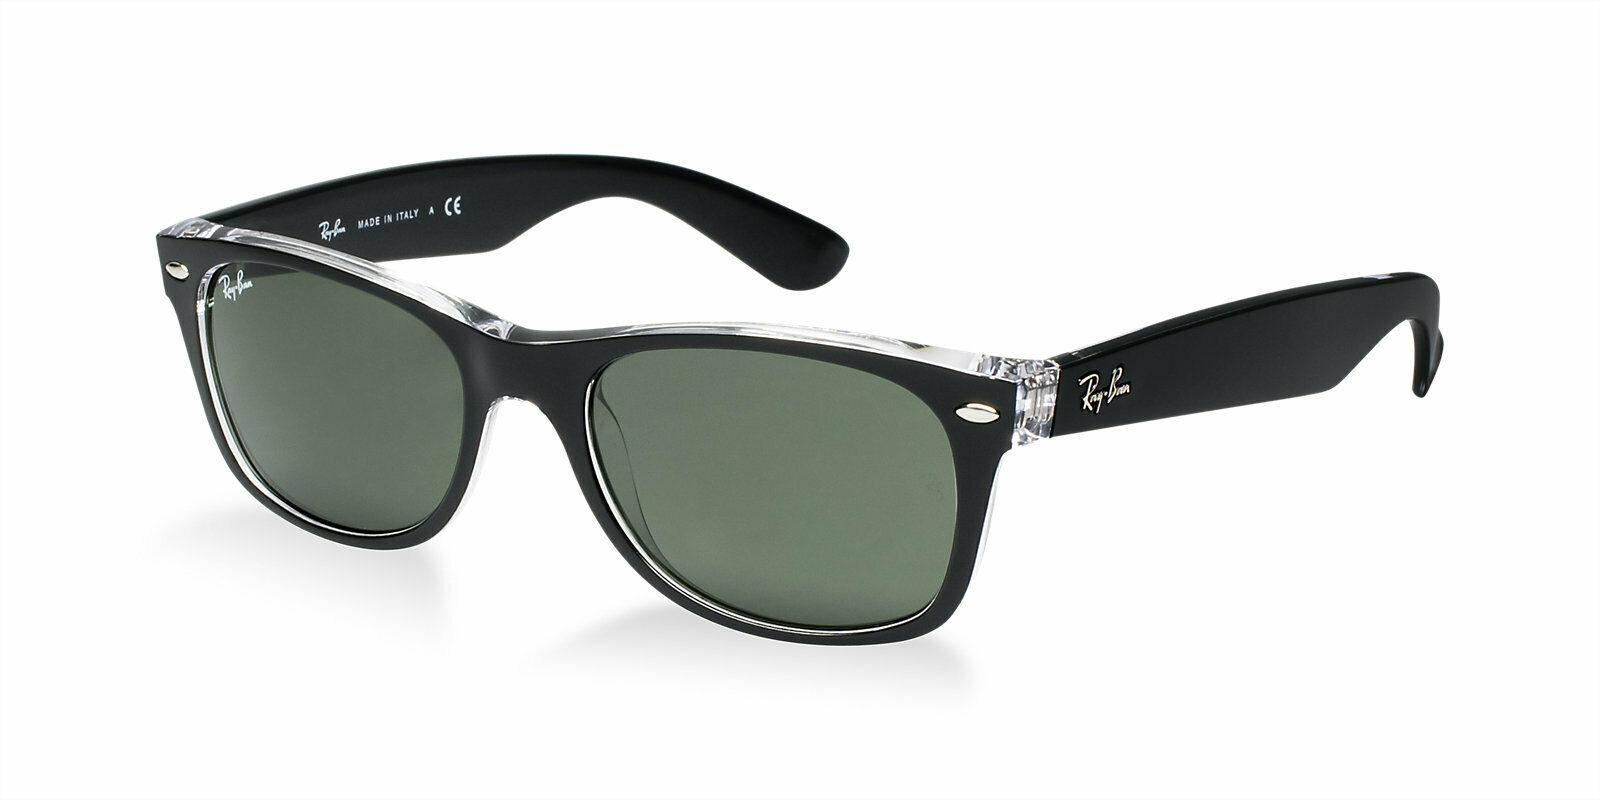 Ray-ban RB2132 605258 Schwarz/Klar Rahmen Polarisiert Grün Linse Sonnenbrille